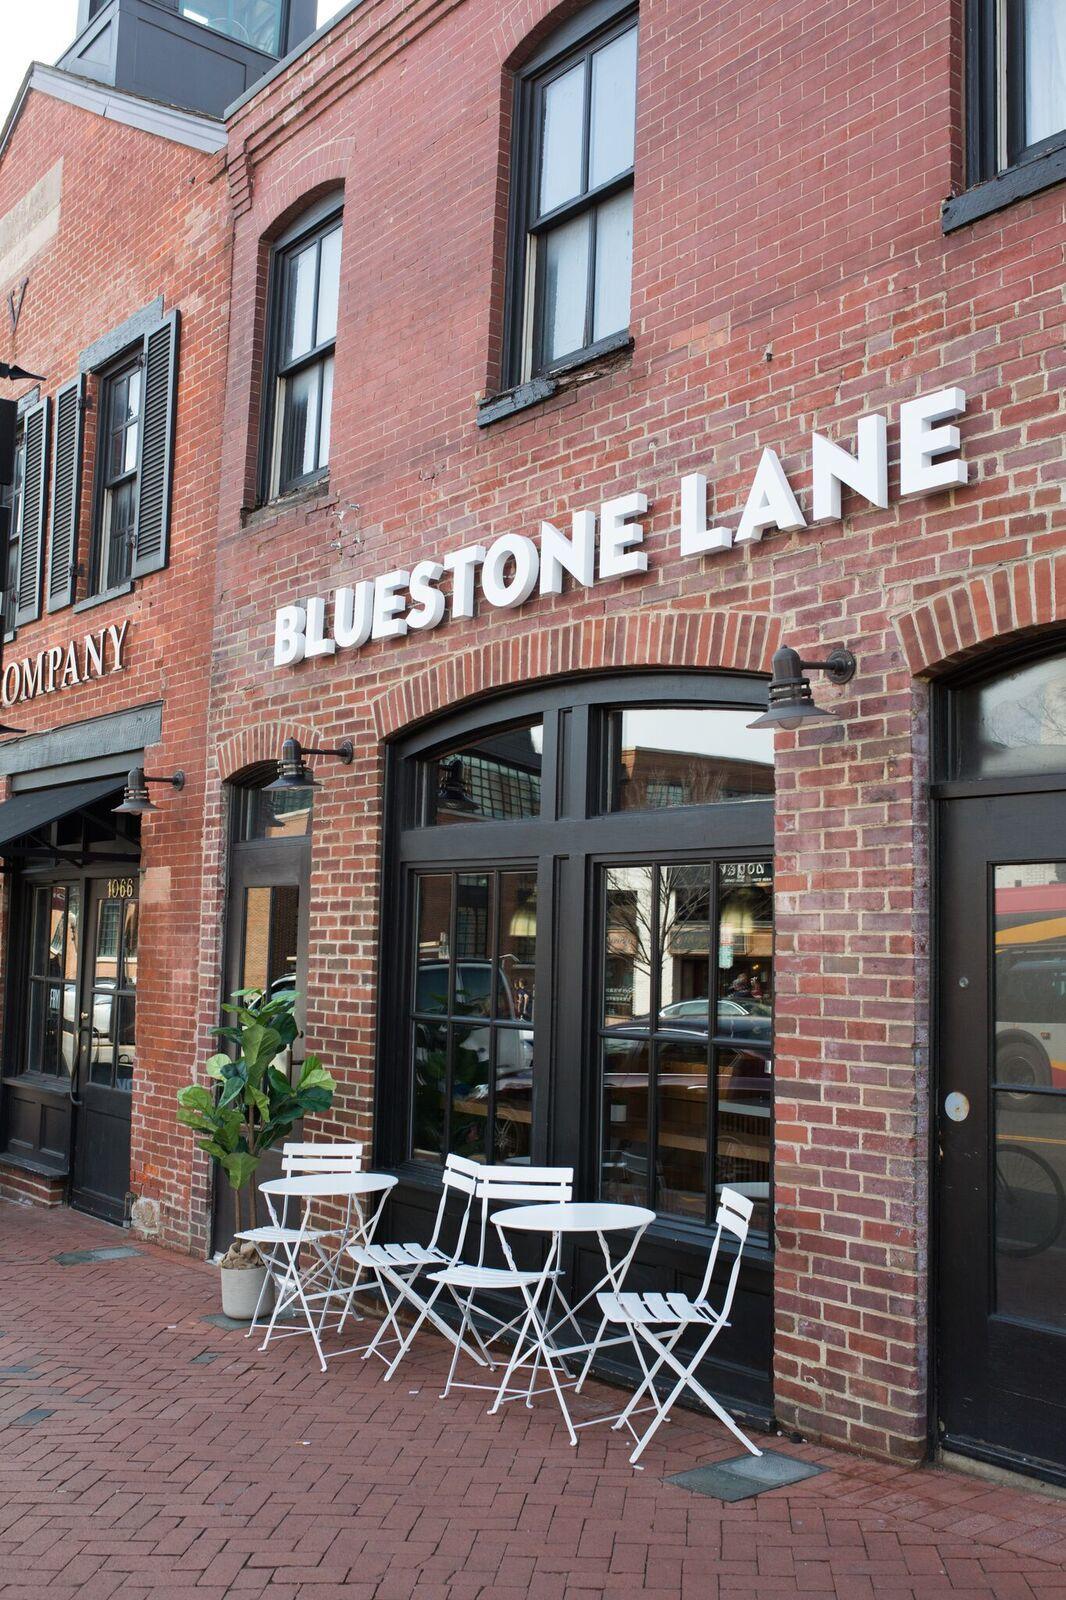 Bluestone Lane image 2